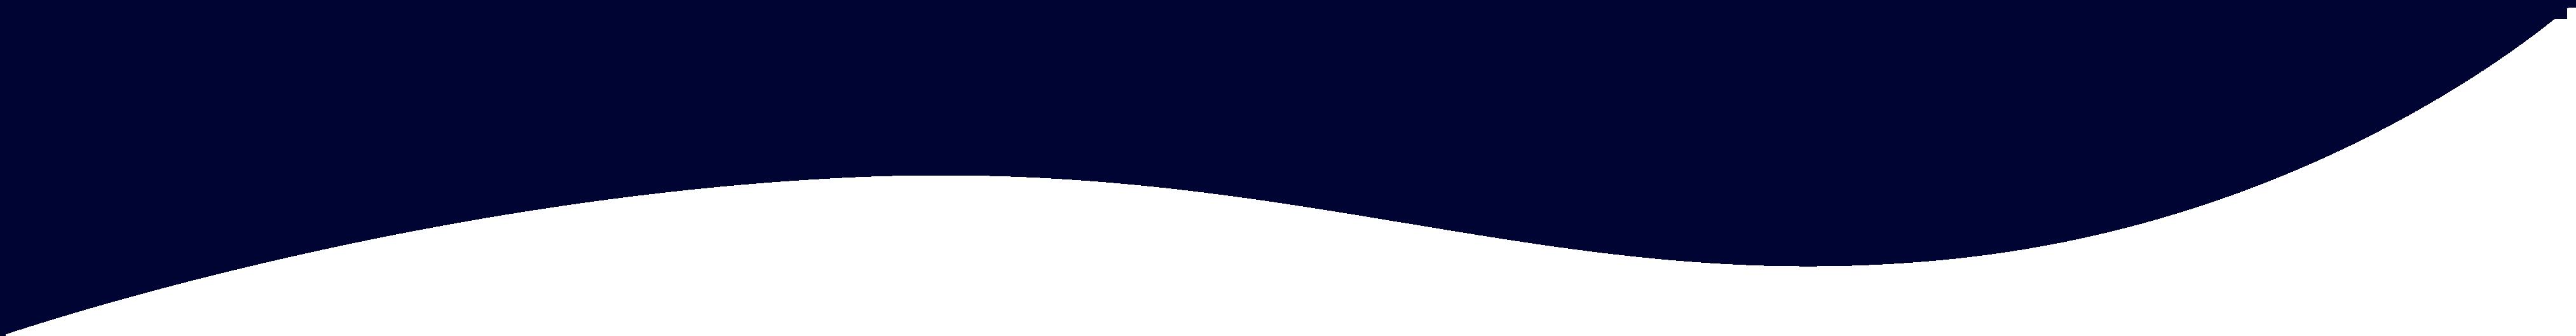 Path 599-2